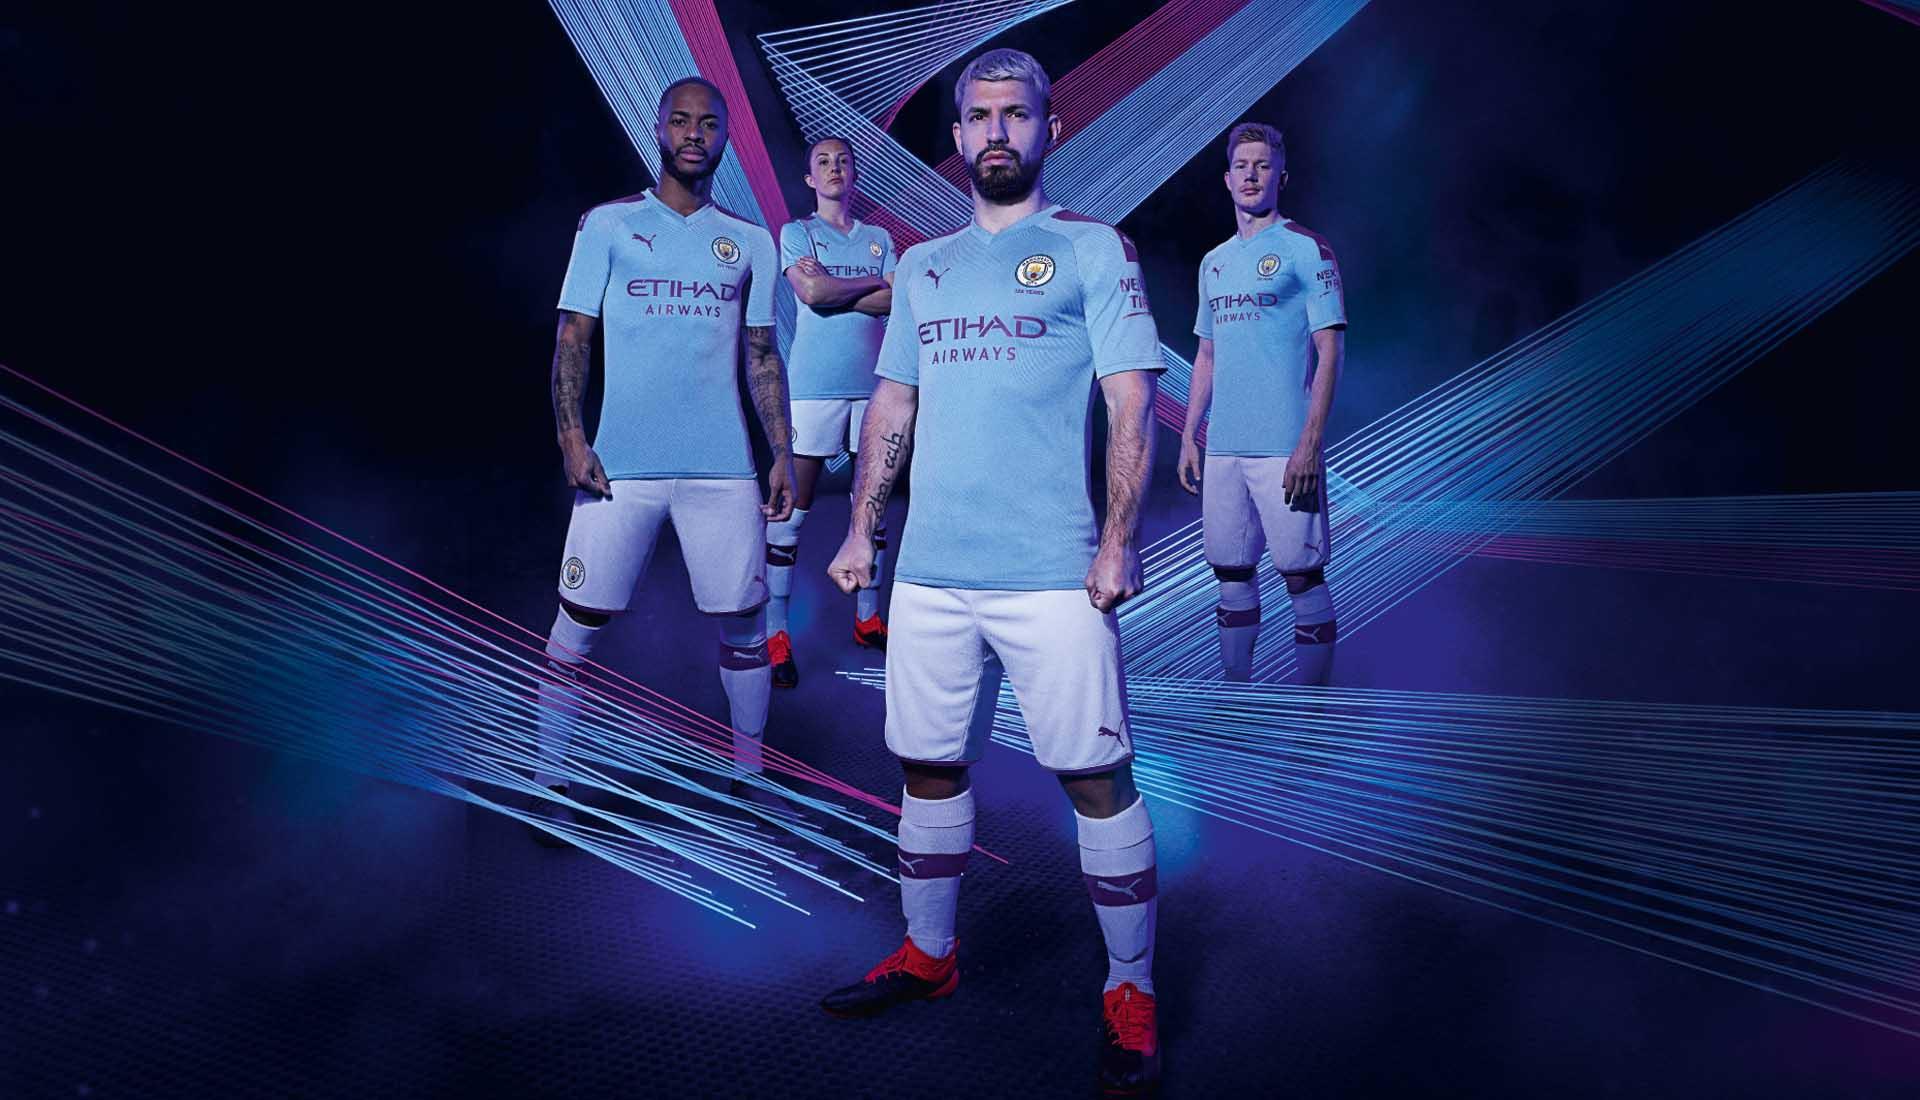 Seragam Kandang Baru 20 Tim Premier League 2019 2020 1